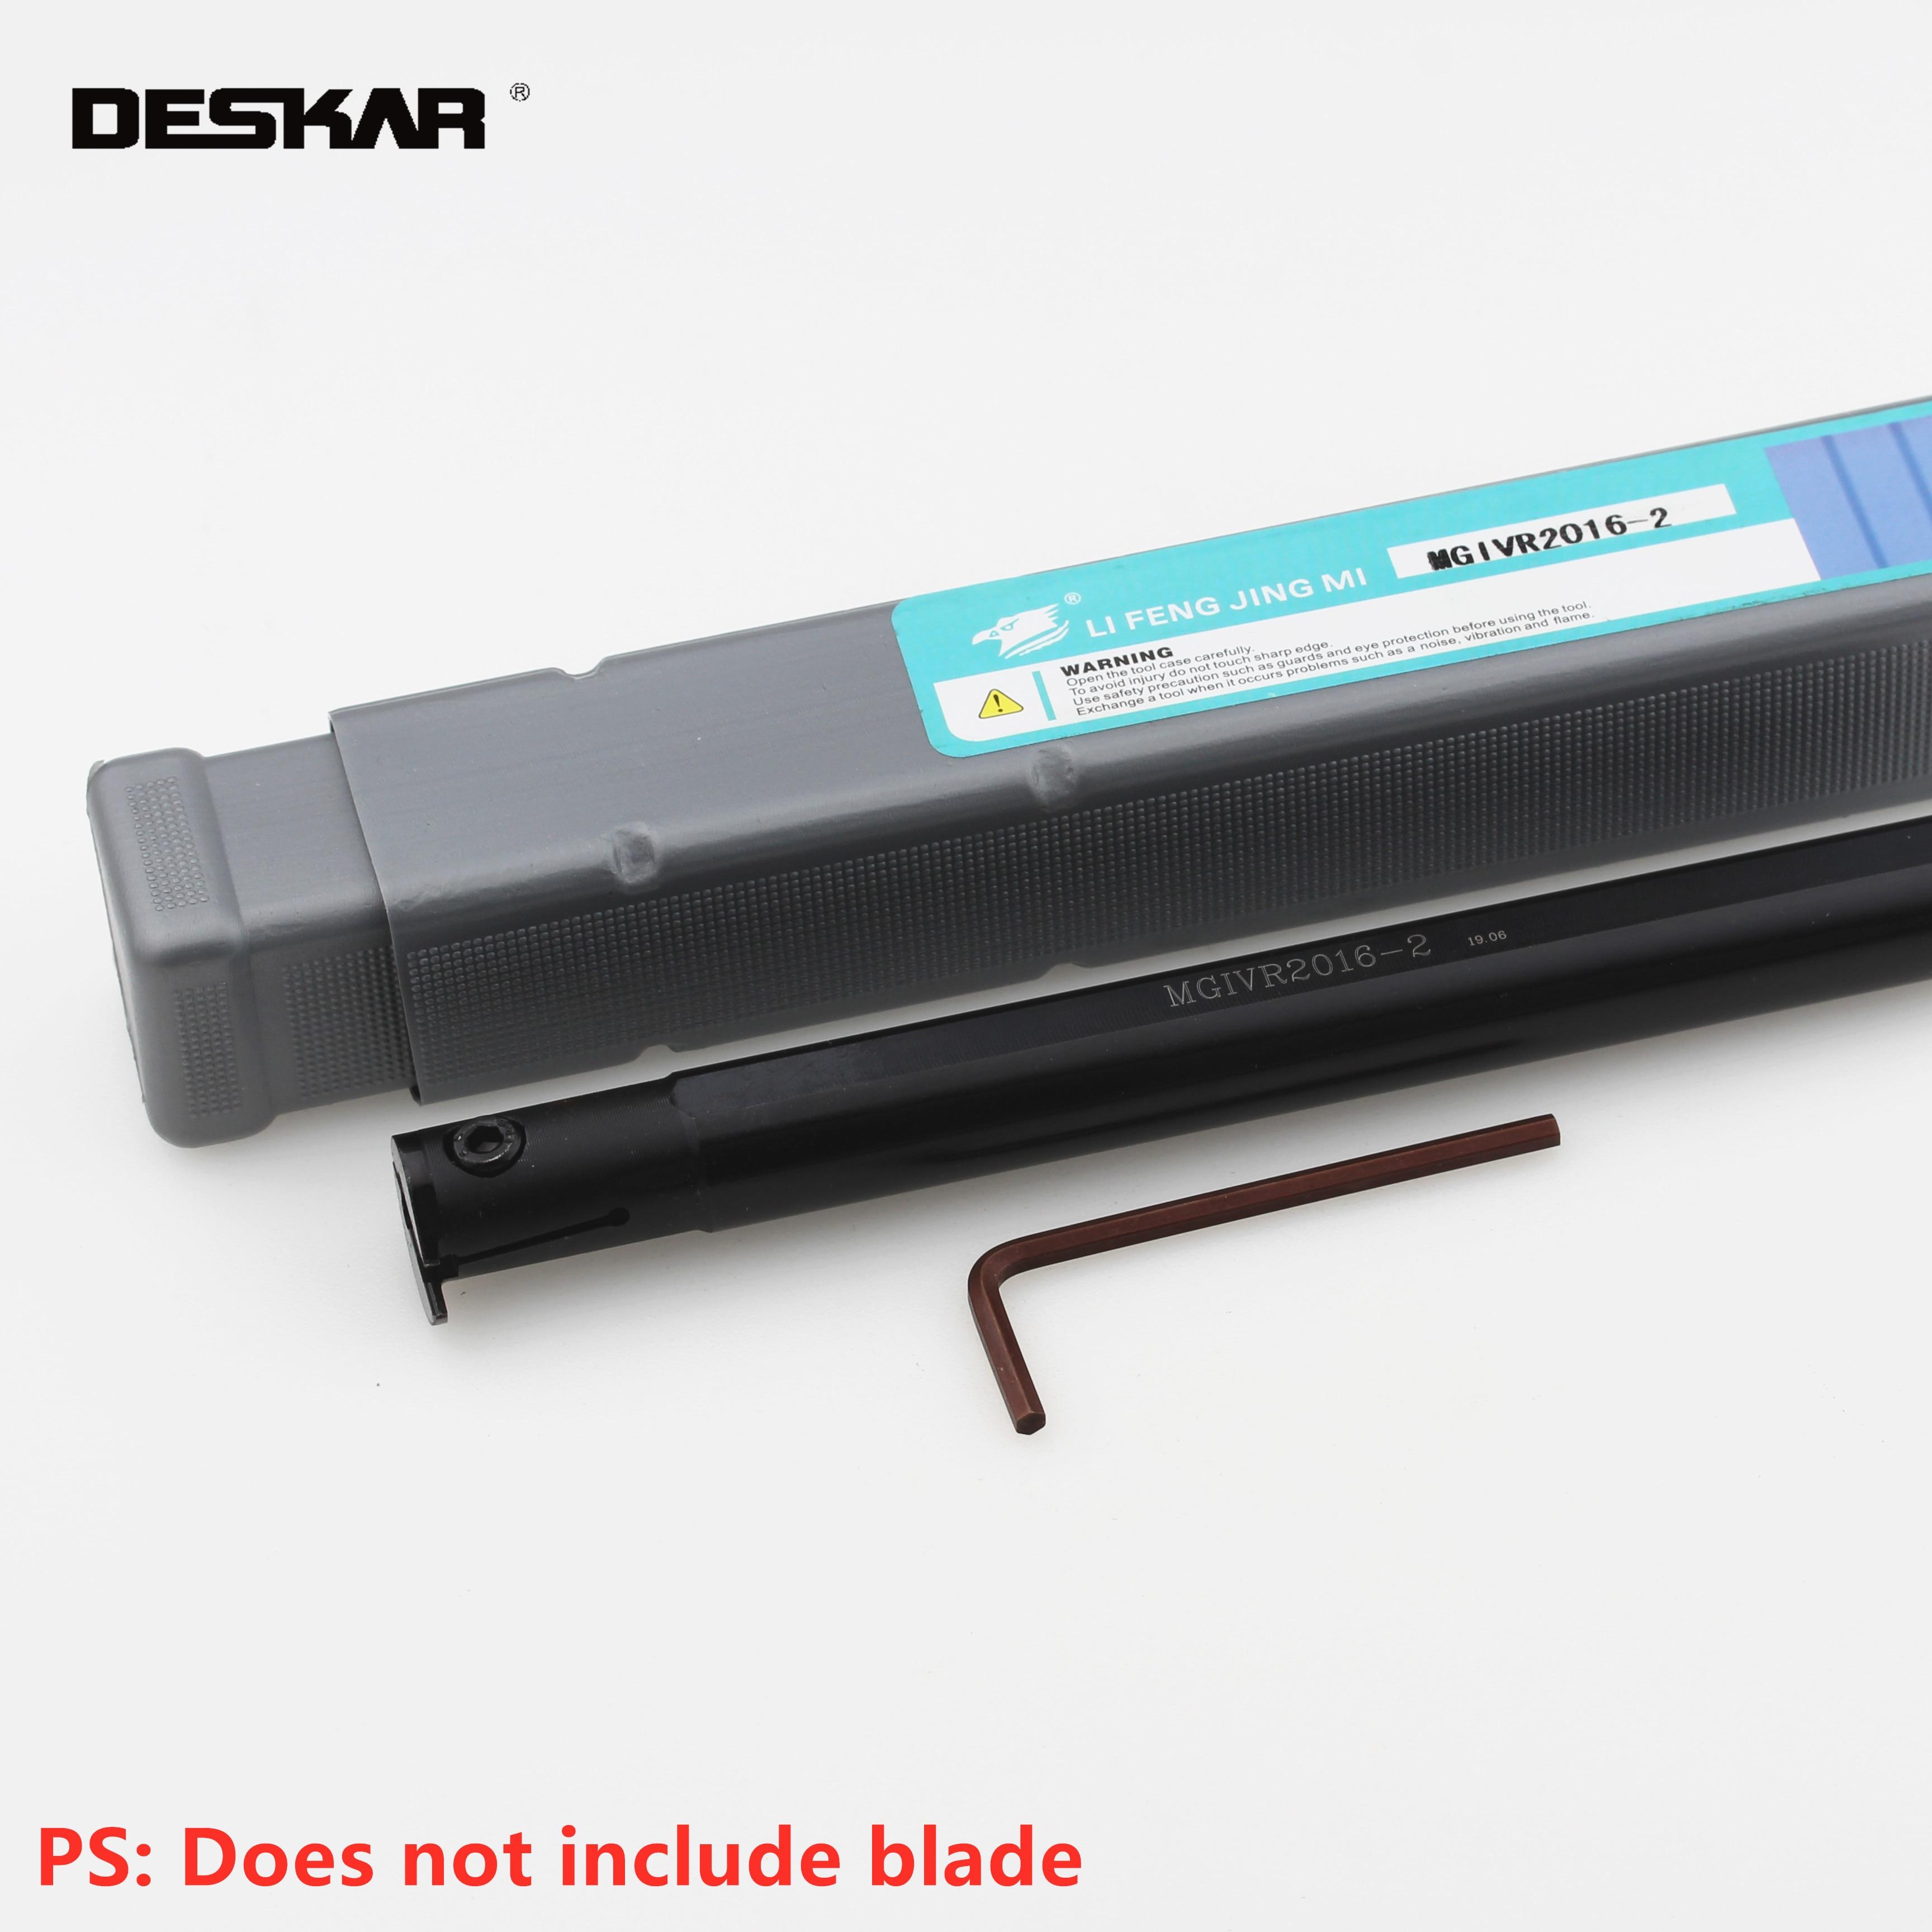 MGEHR1616-1.5 Korloy MGMN150 1.5mm EXTERNAL GROOVING TOOLHOLDERS 1Pcs